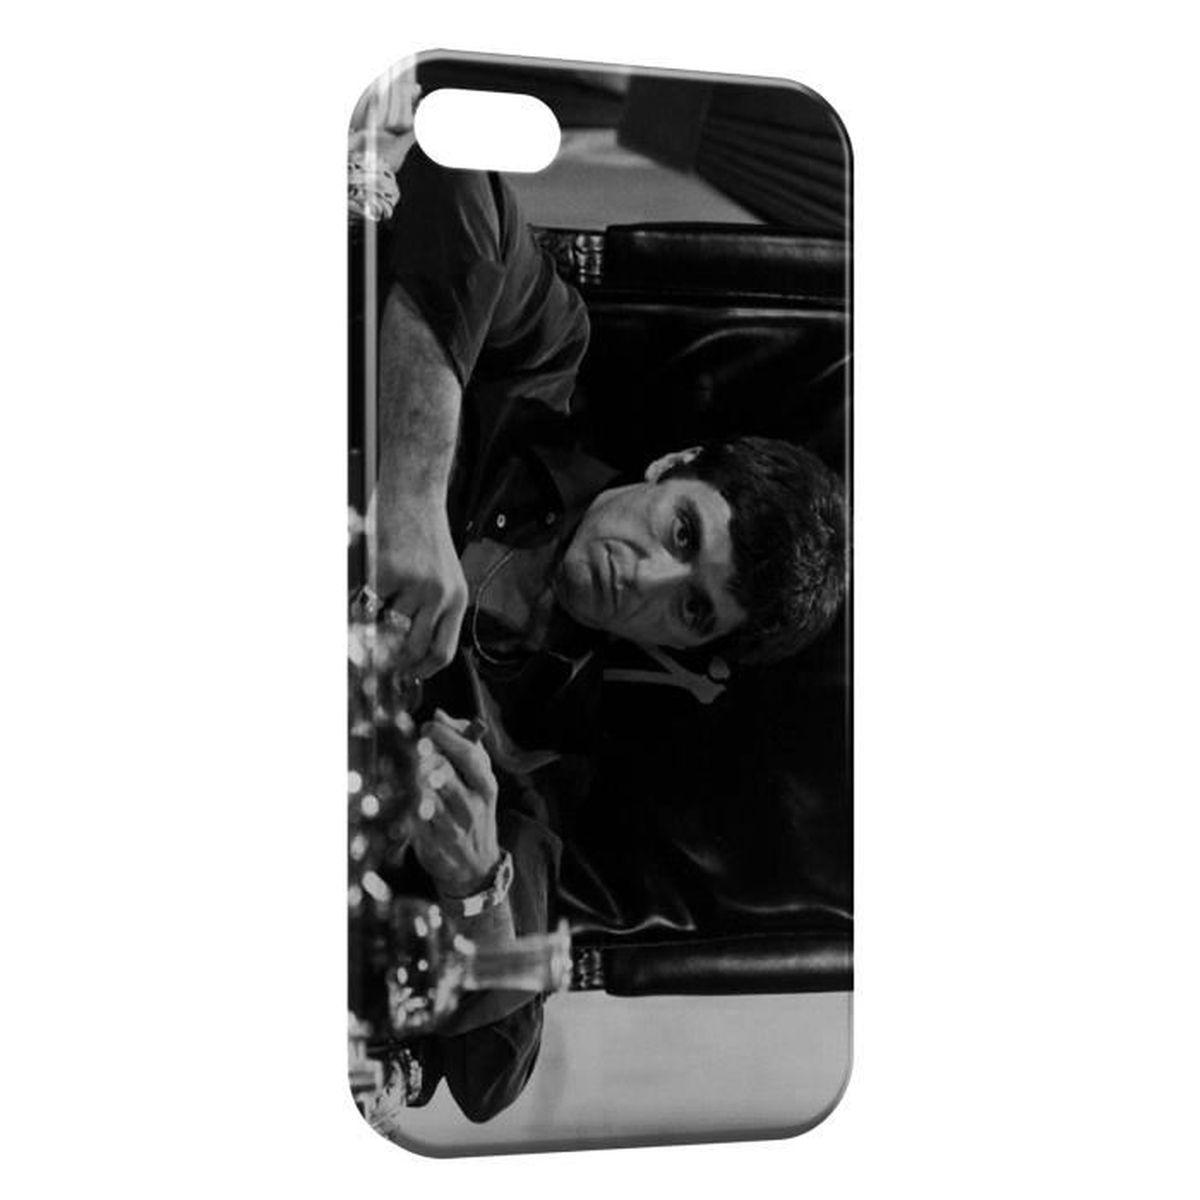 Coque iPhone SE Tony Montana Scarface - Cdiscount Téléphonie